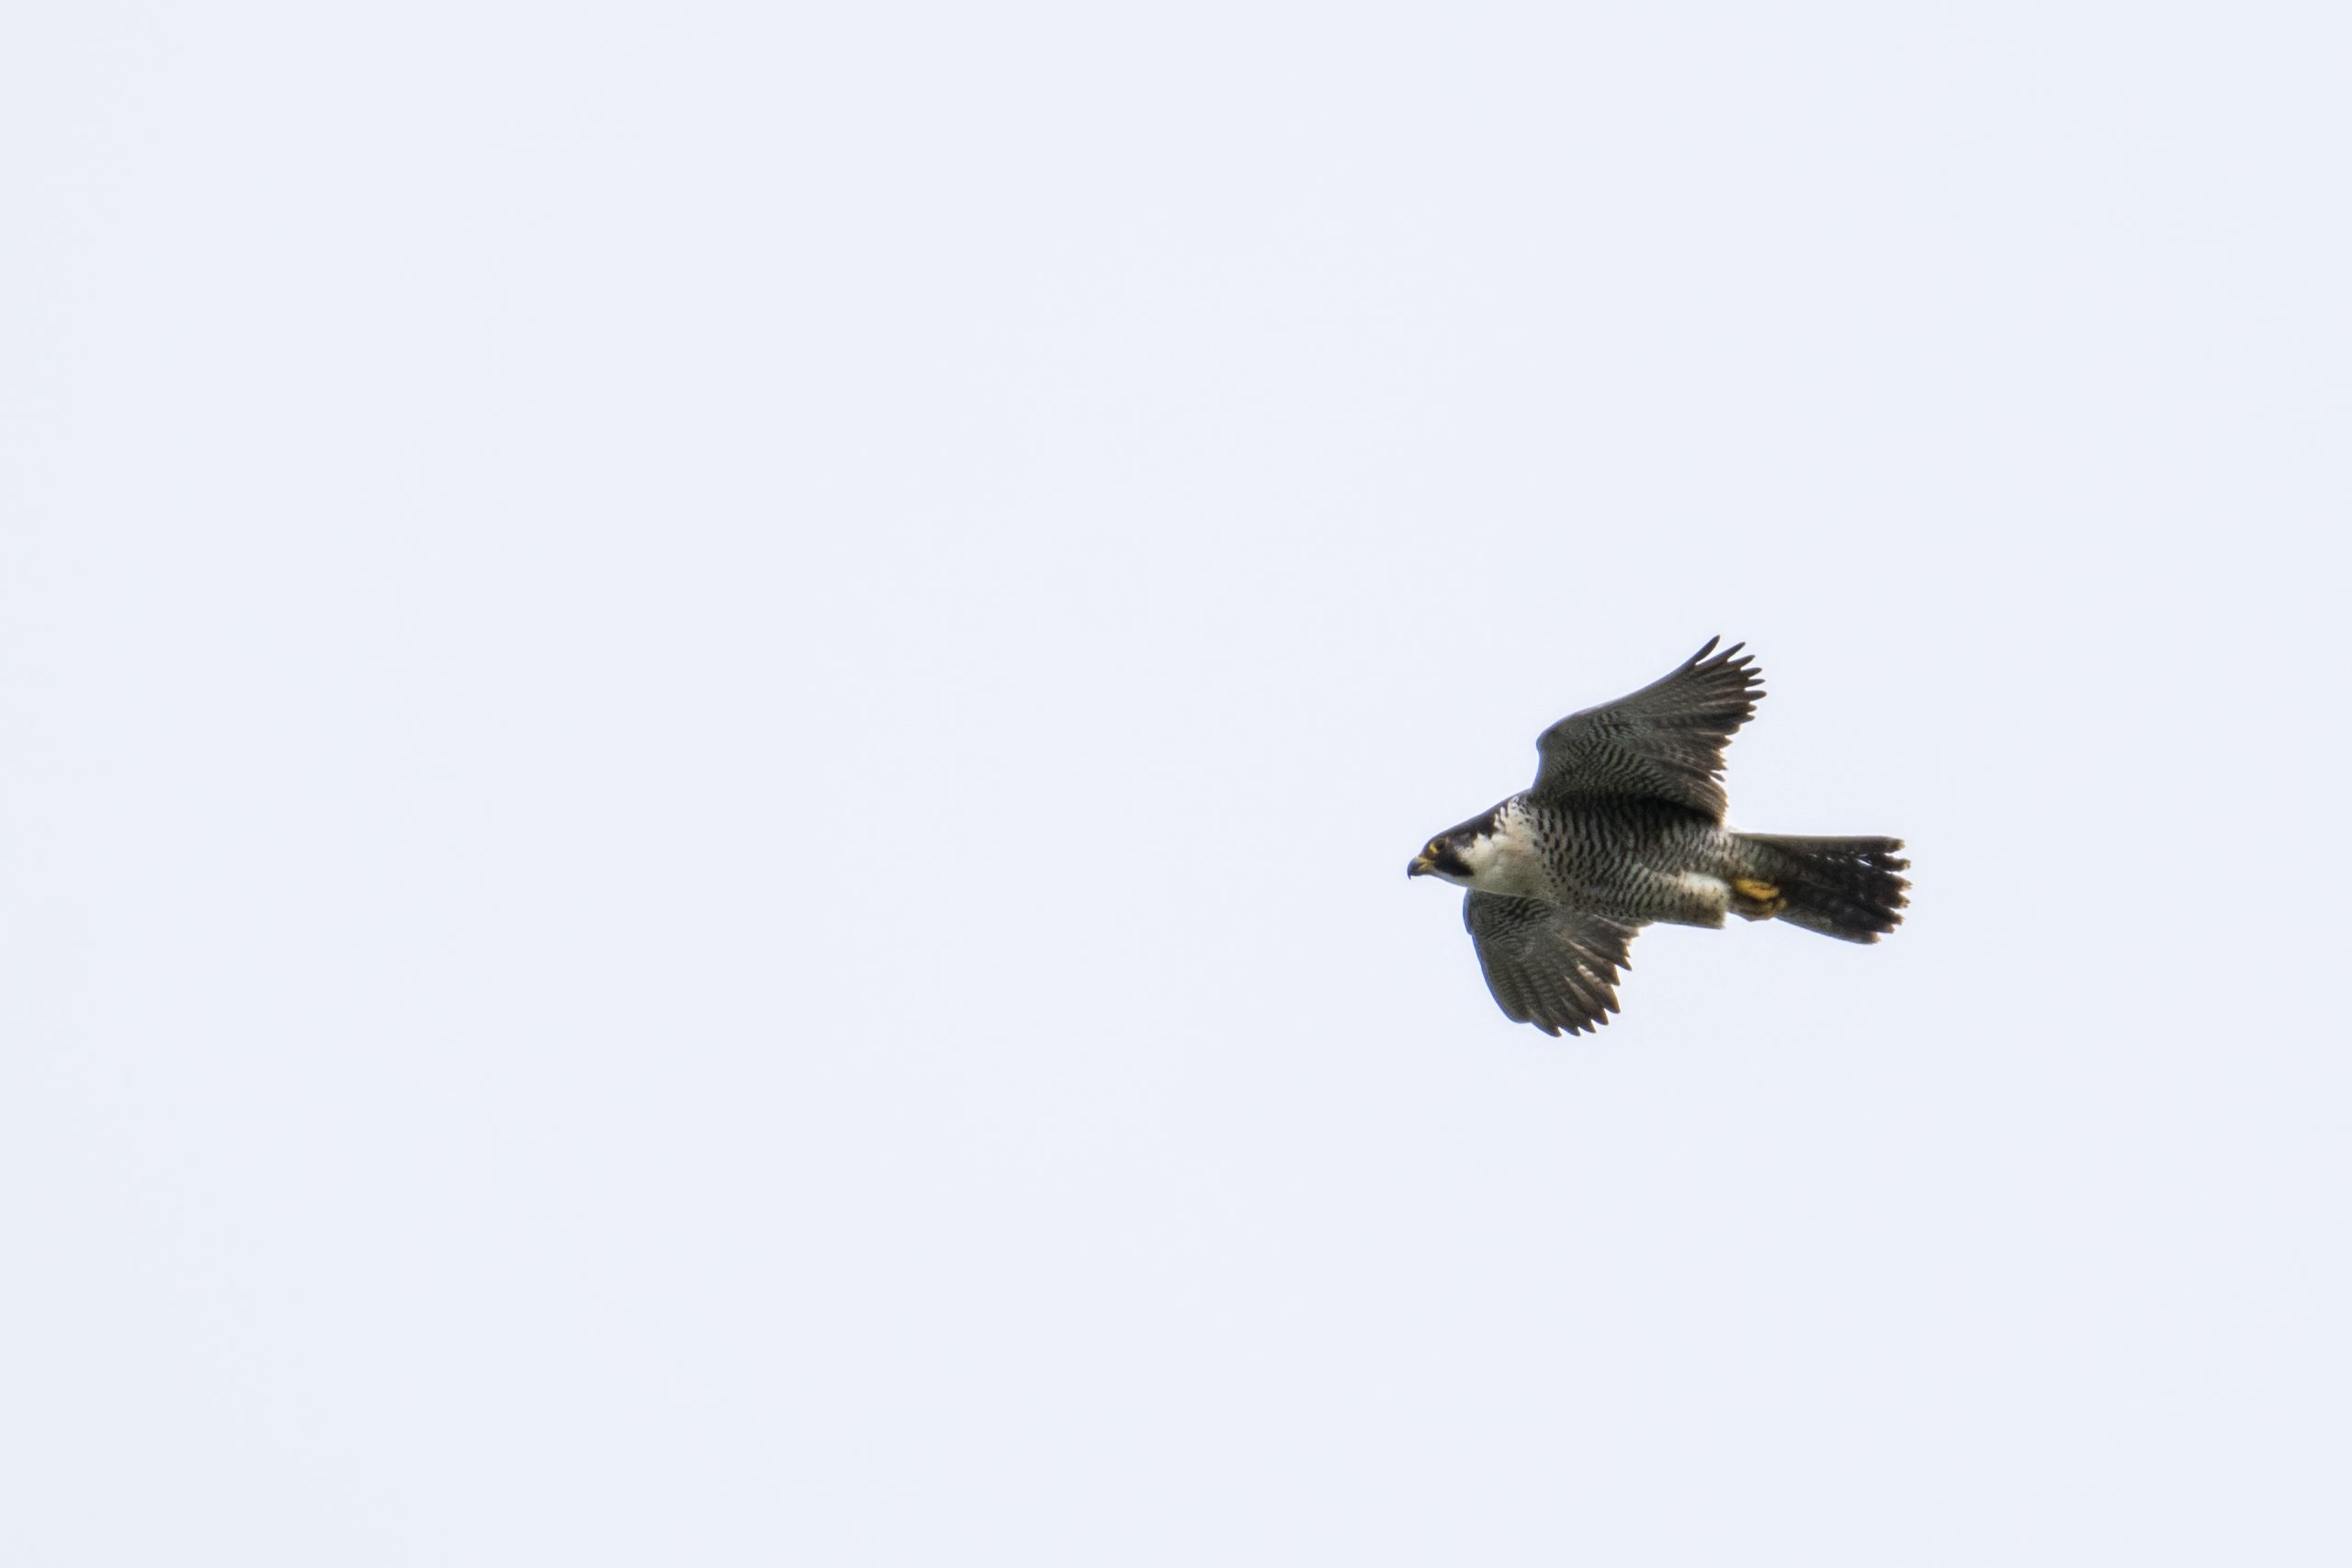 DAVID_JEFFERY Dalby Forest and Ravenscar 05.06.18 0016